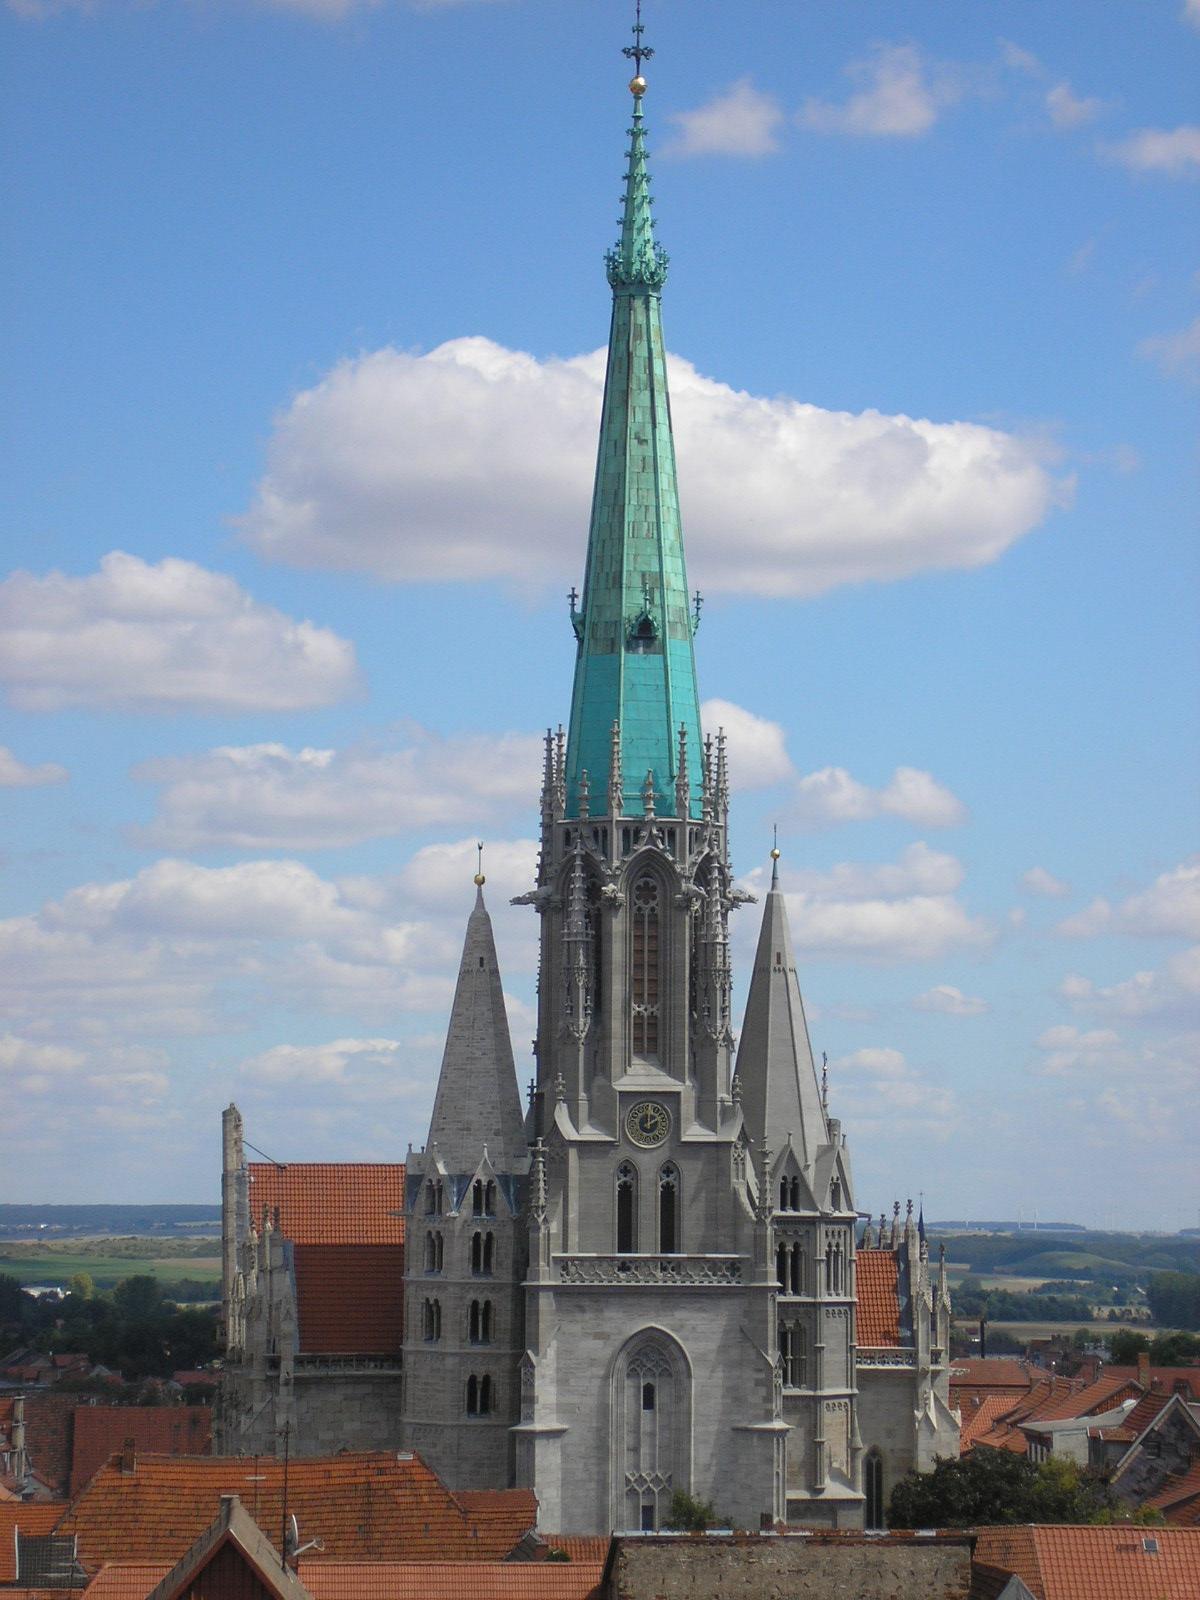 St. Mary's Church, Mühlhausen - Wikipedia